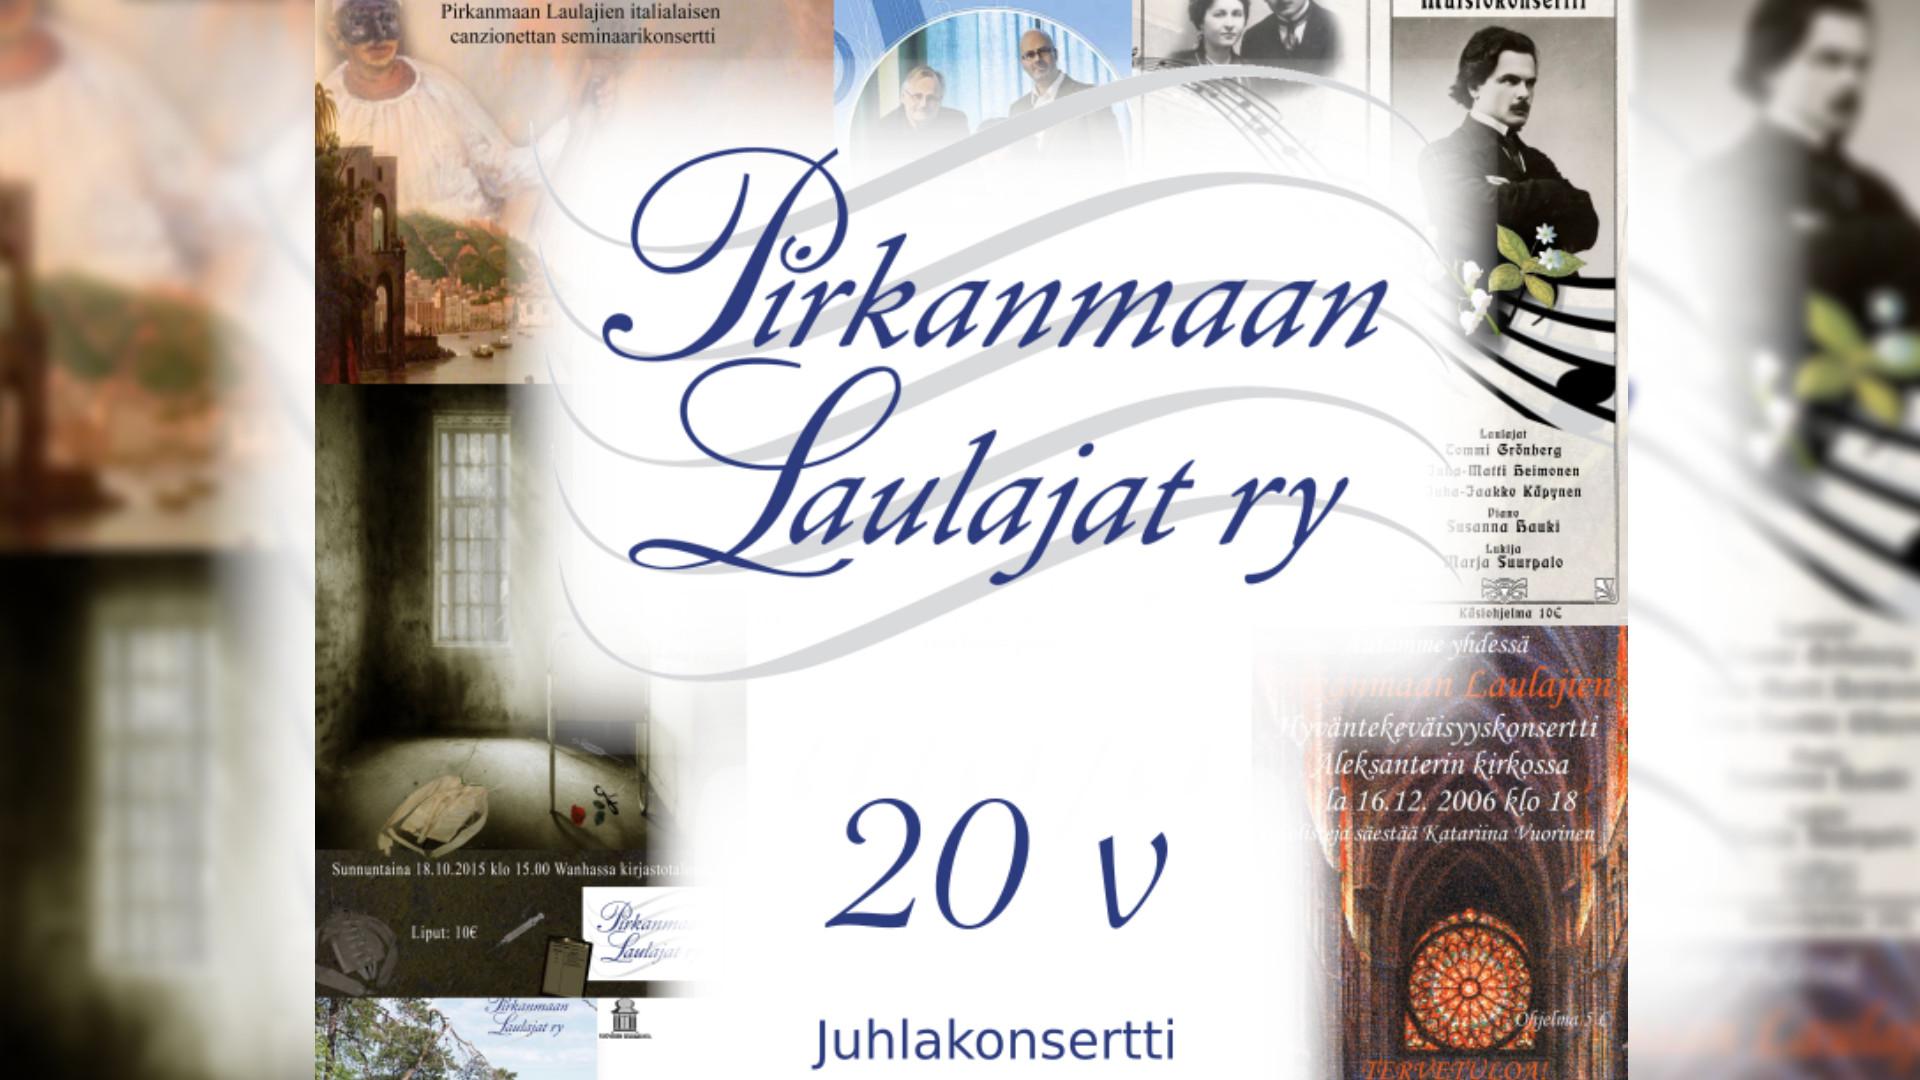 Pirkanmaan Laulajat ry:n 20-vuotisjuhlakonsertti